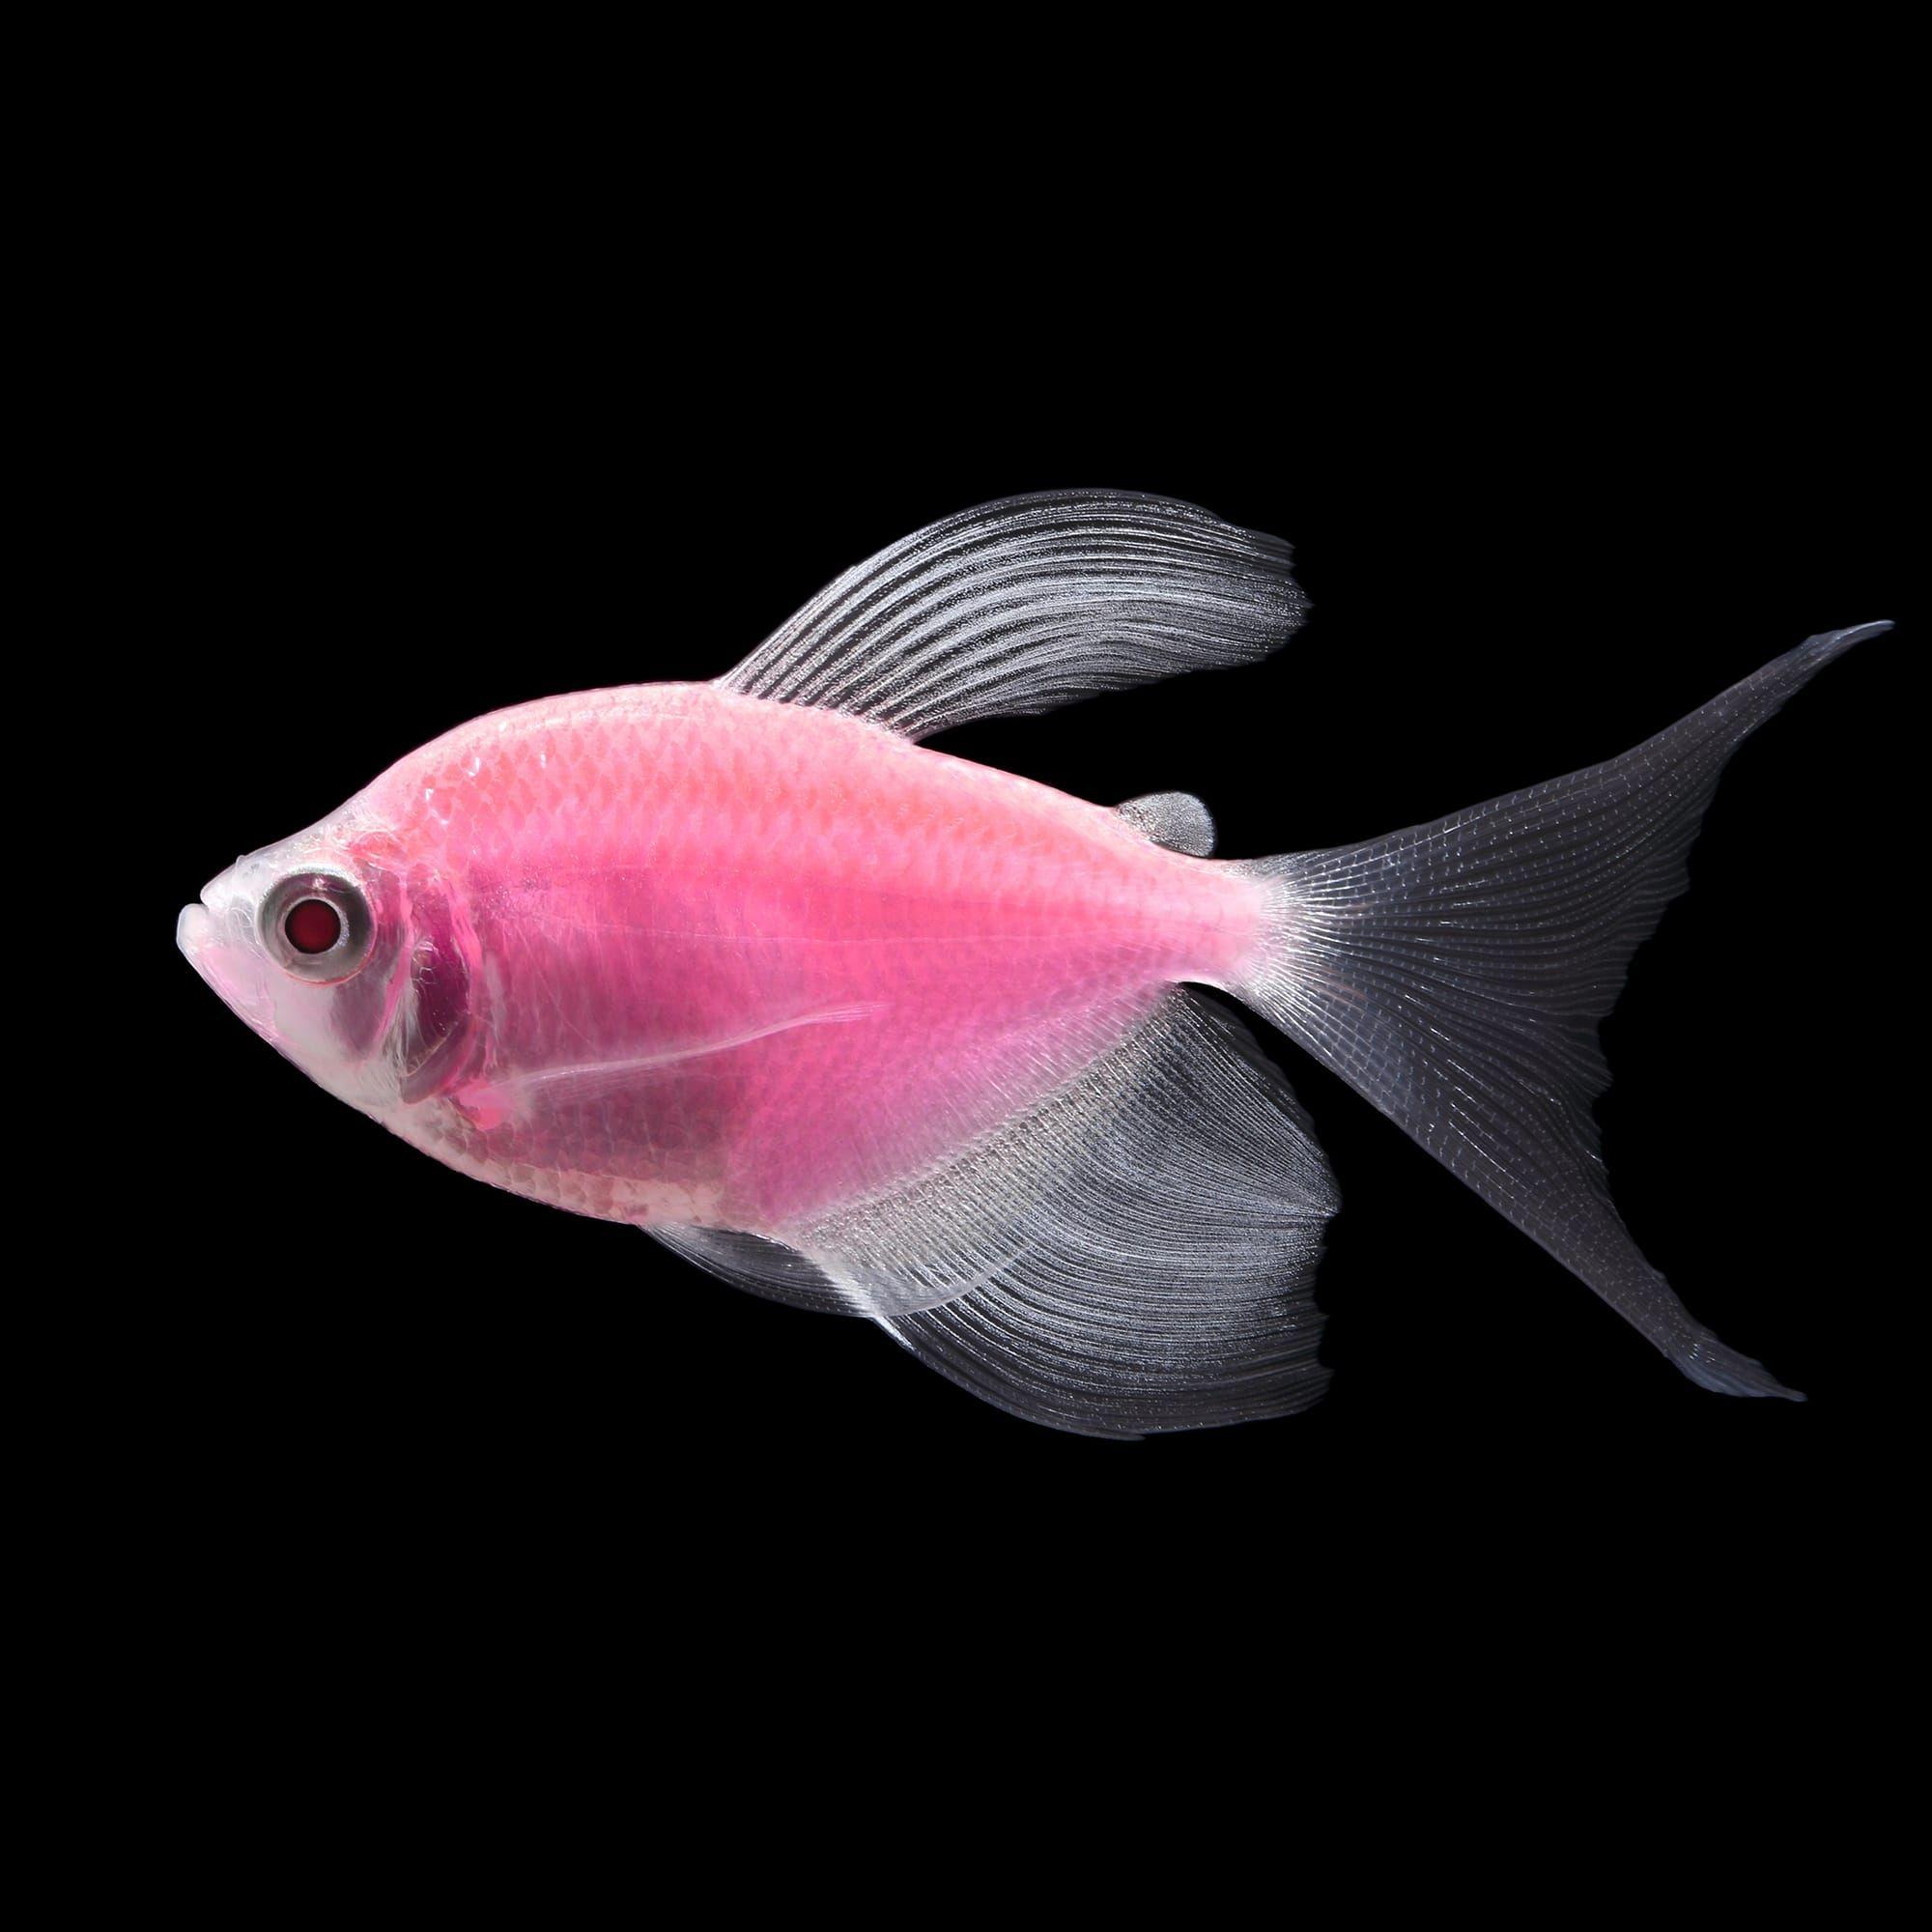 Glofish Moonrise Pink Longfin Tetras For Sale Petco In 2020 Glofish Live Freshwater Fish Freshwater Aquarium Fish